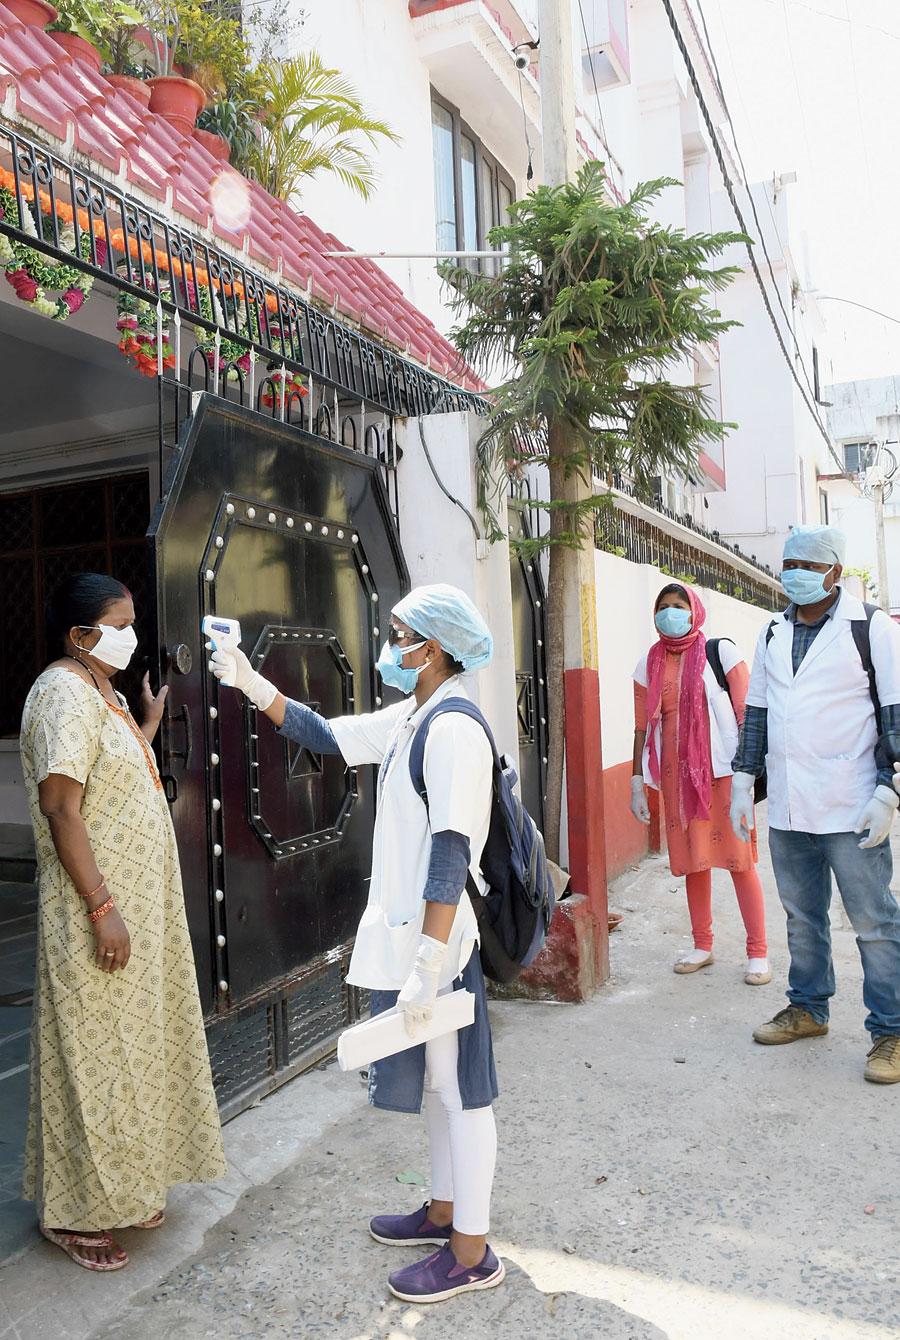 A health worker screens a resident of the novel coronavirus symptoms near Hindpiri in Ranchi on Tuesday.